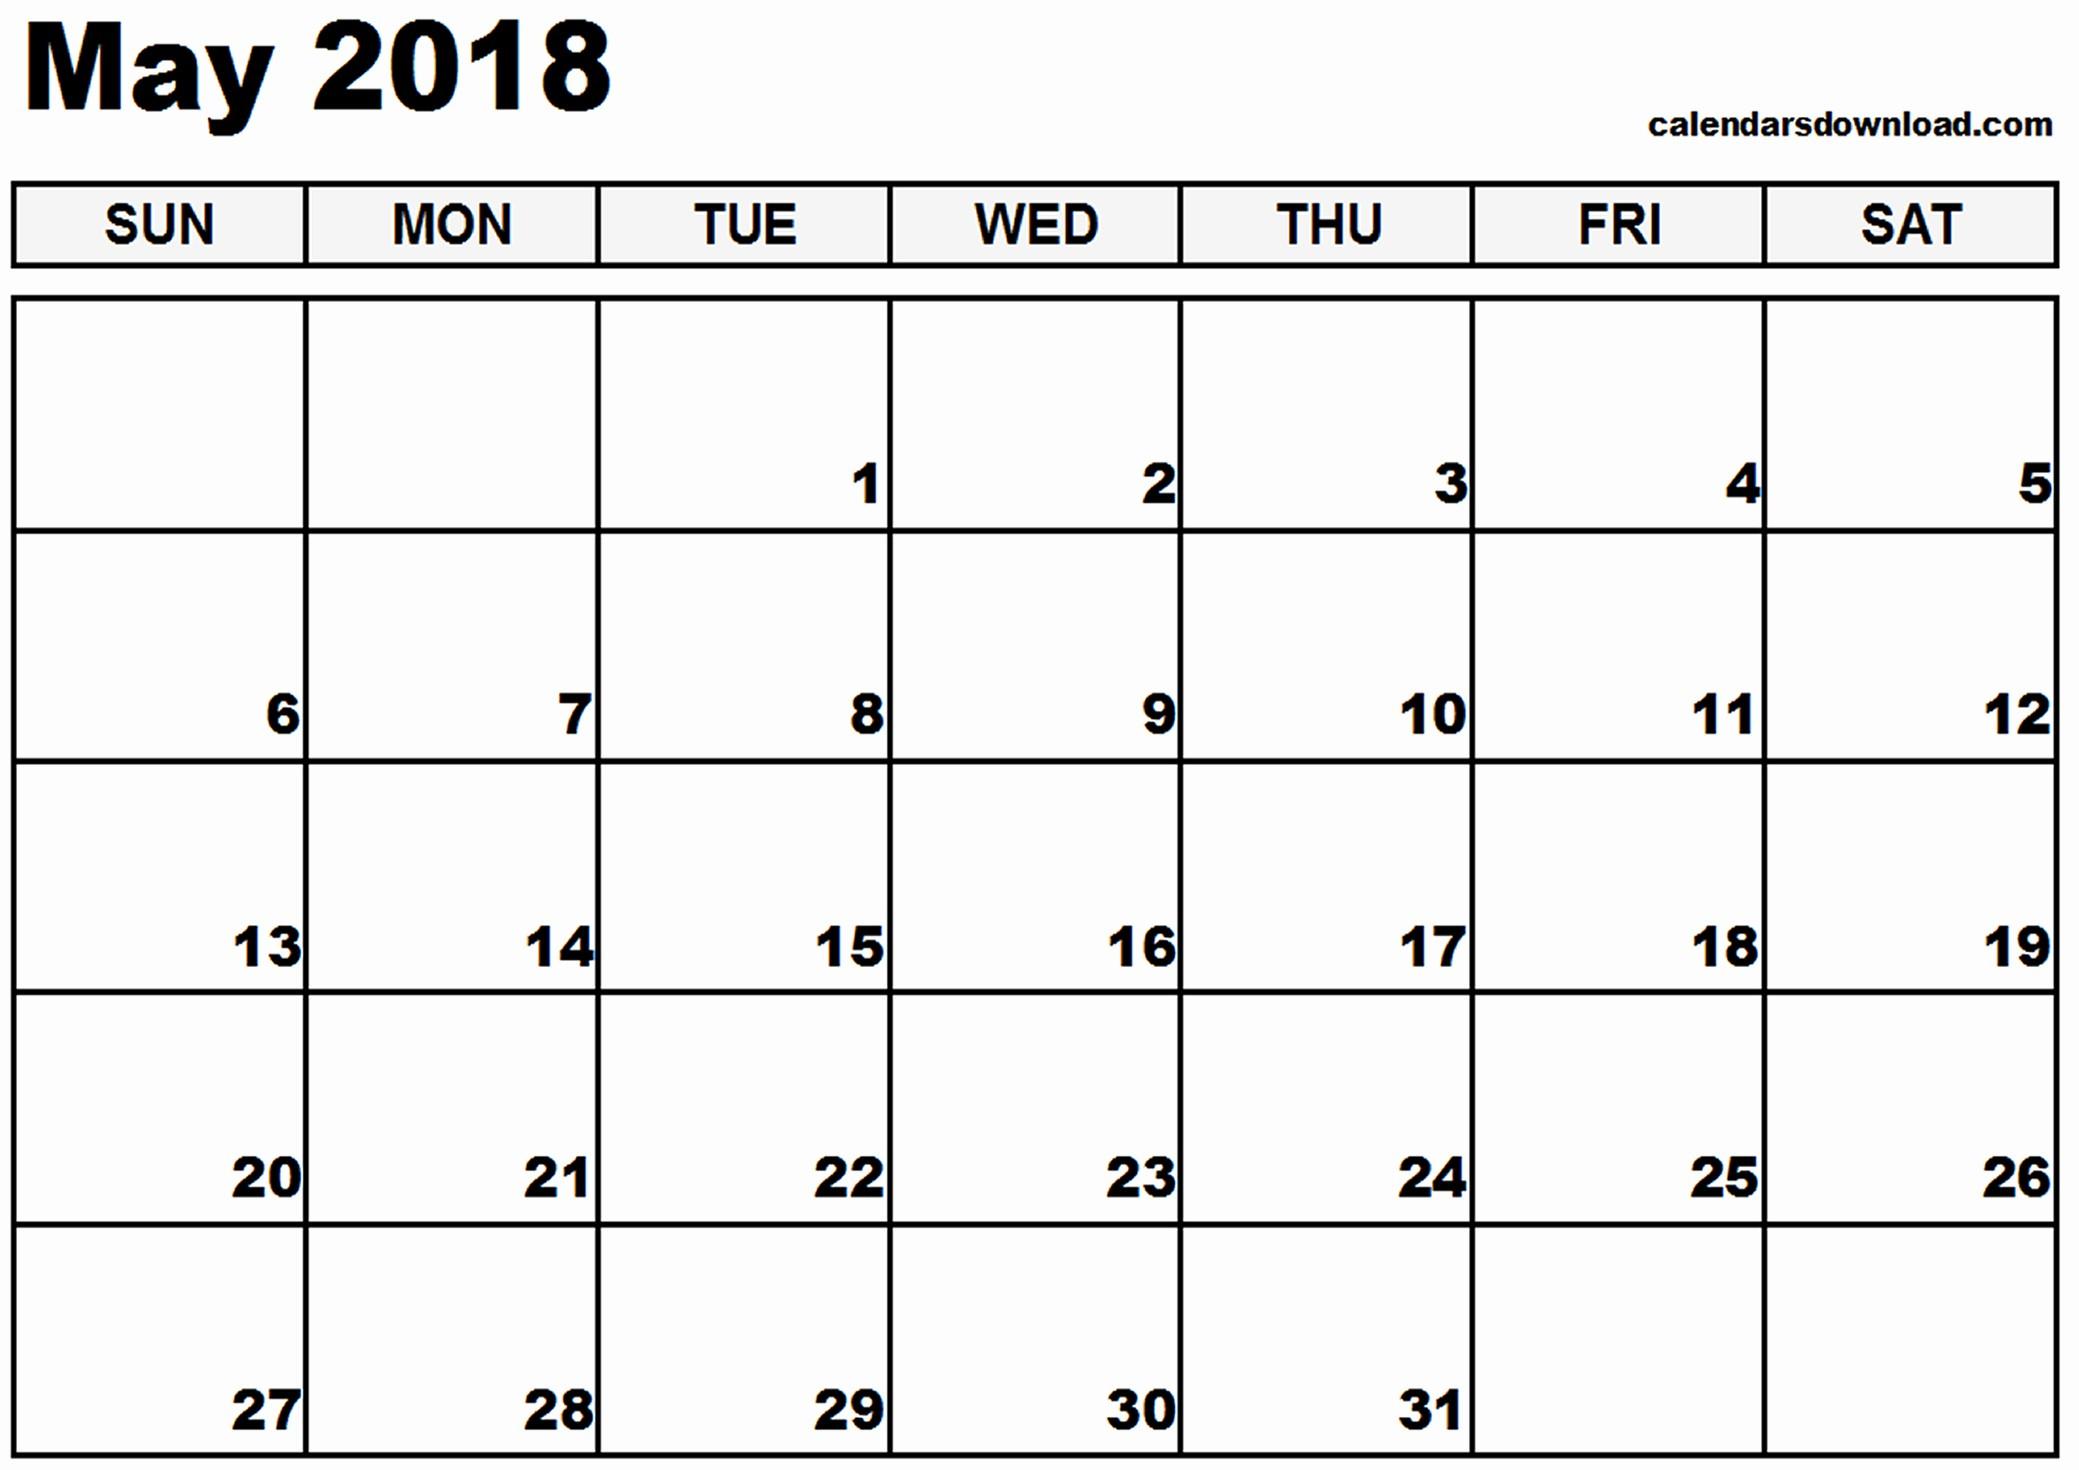 Free May 2018 Calendar Template Awesome May 2018 Printable Calendar